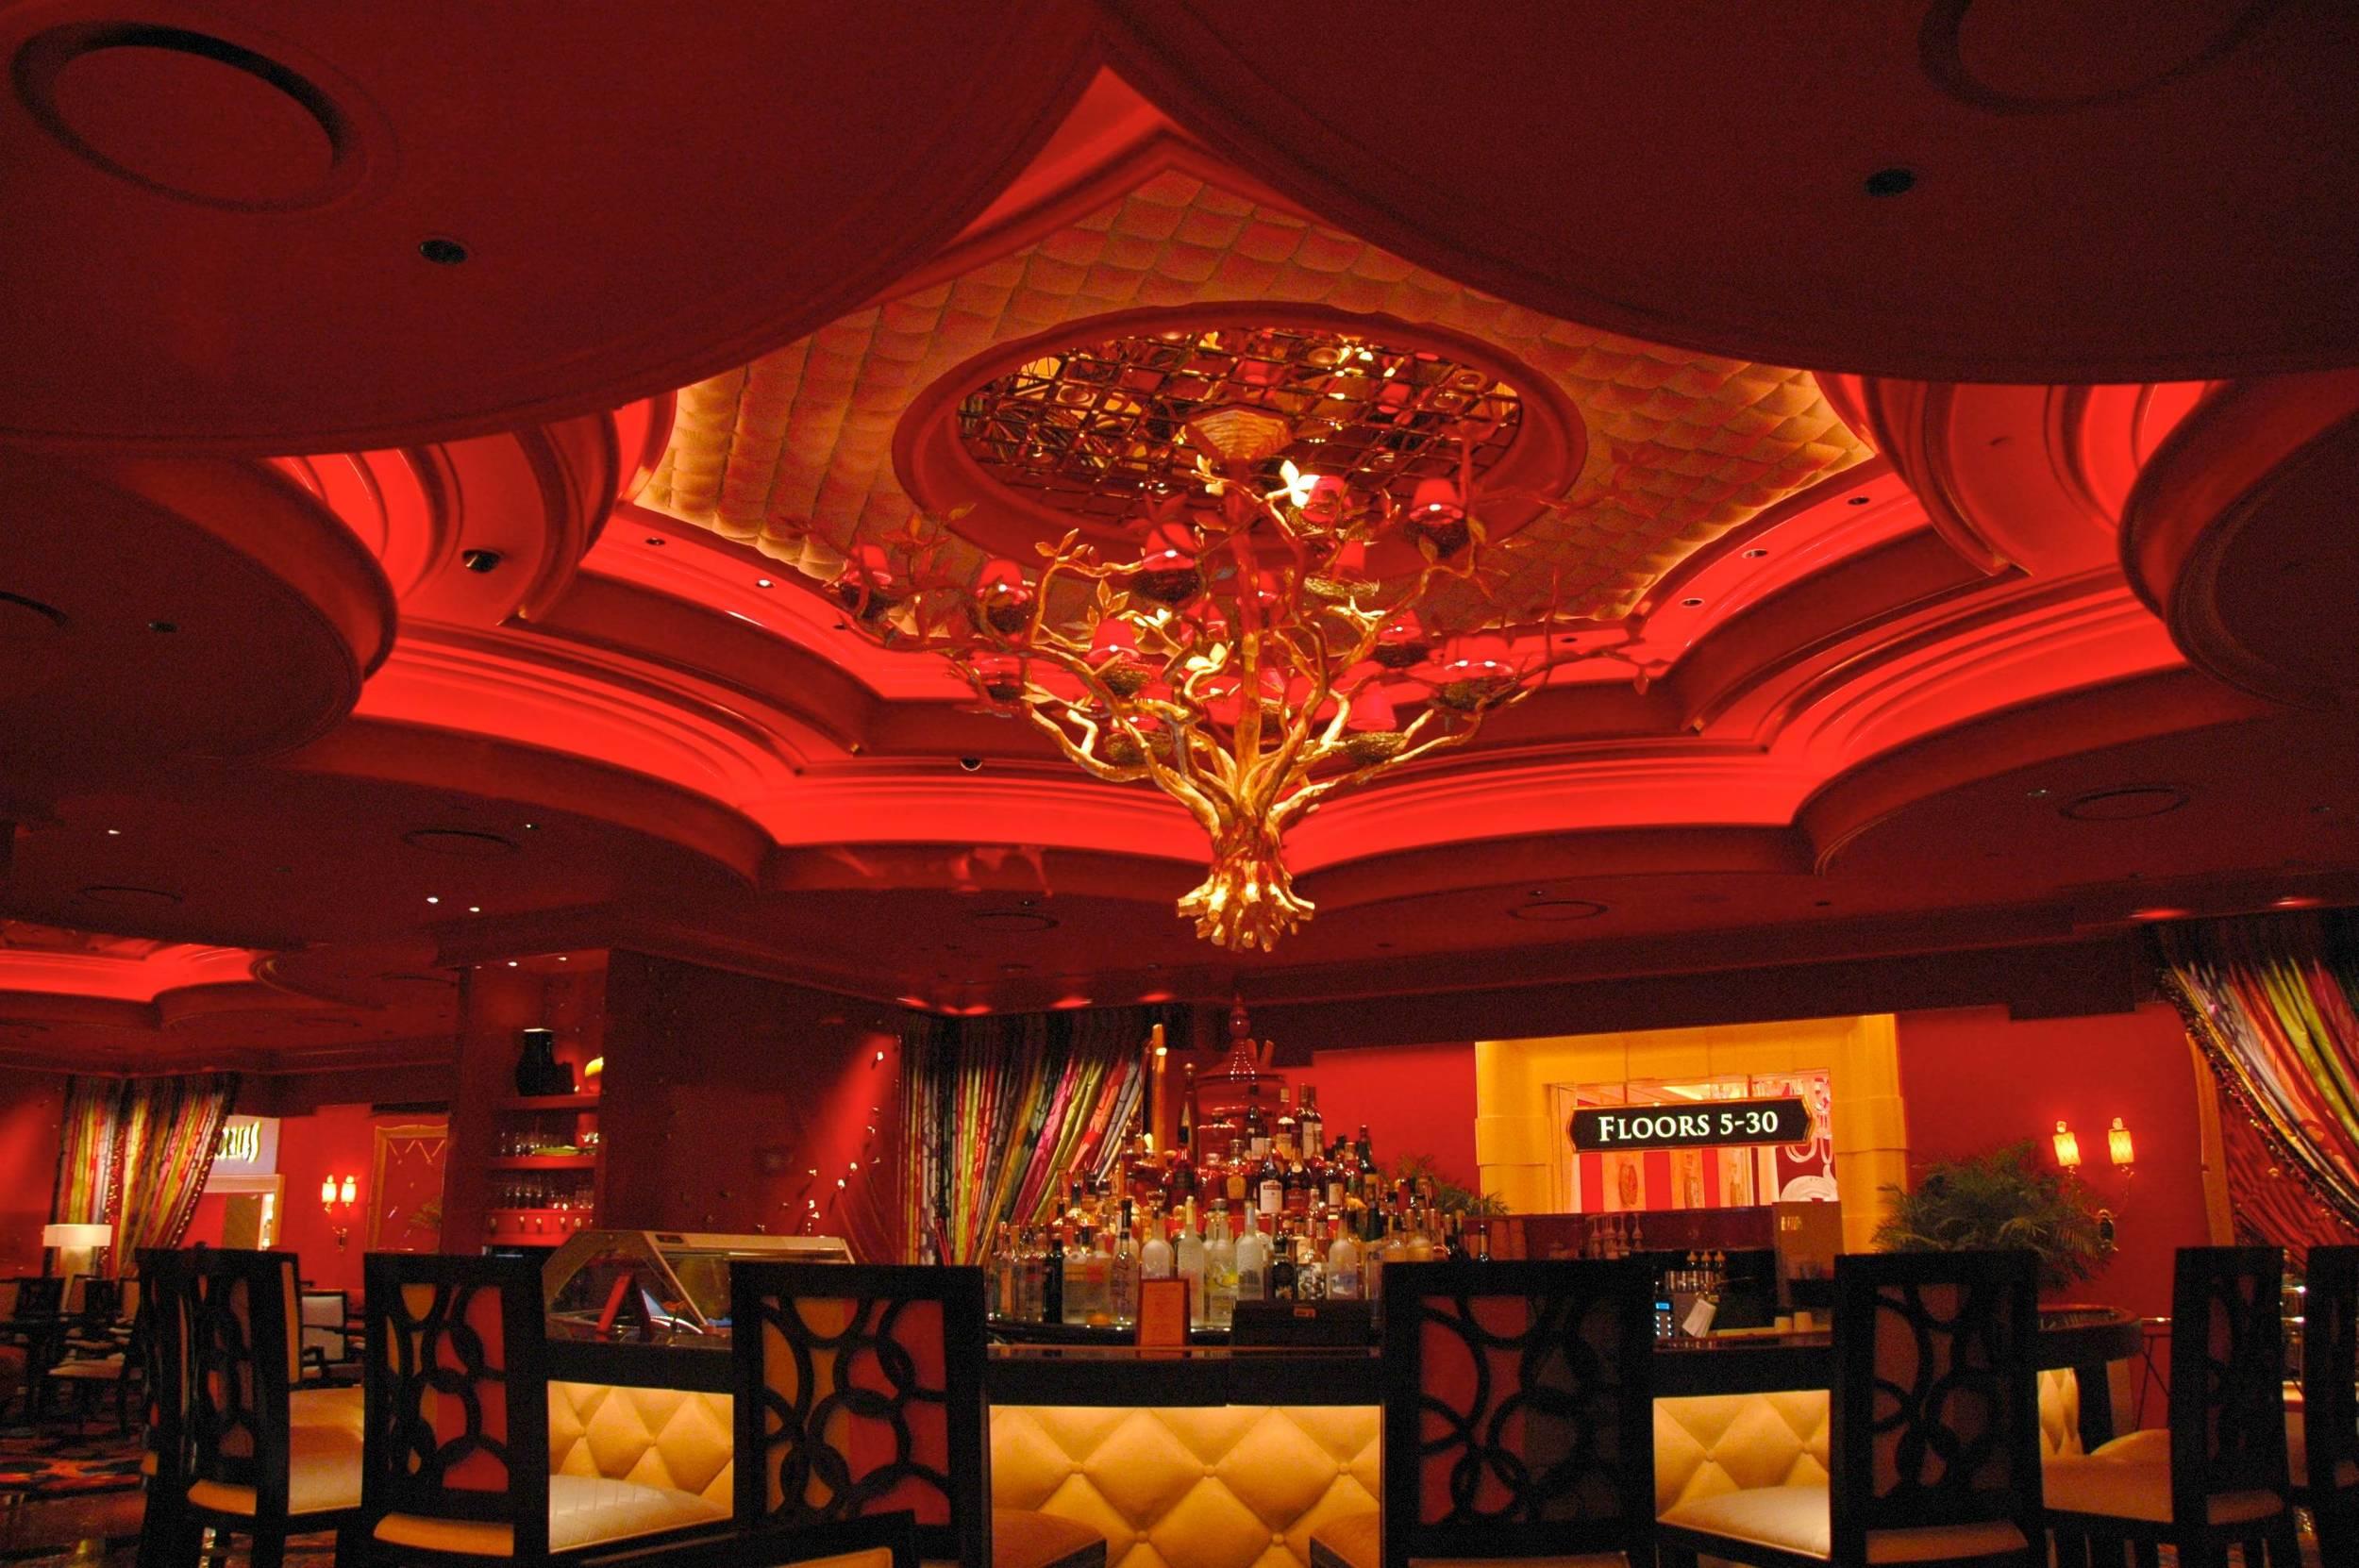 Canyon Ranch SpaClub - Las Vegas Top 7 Spas Vegaster Travel App.jpg